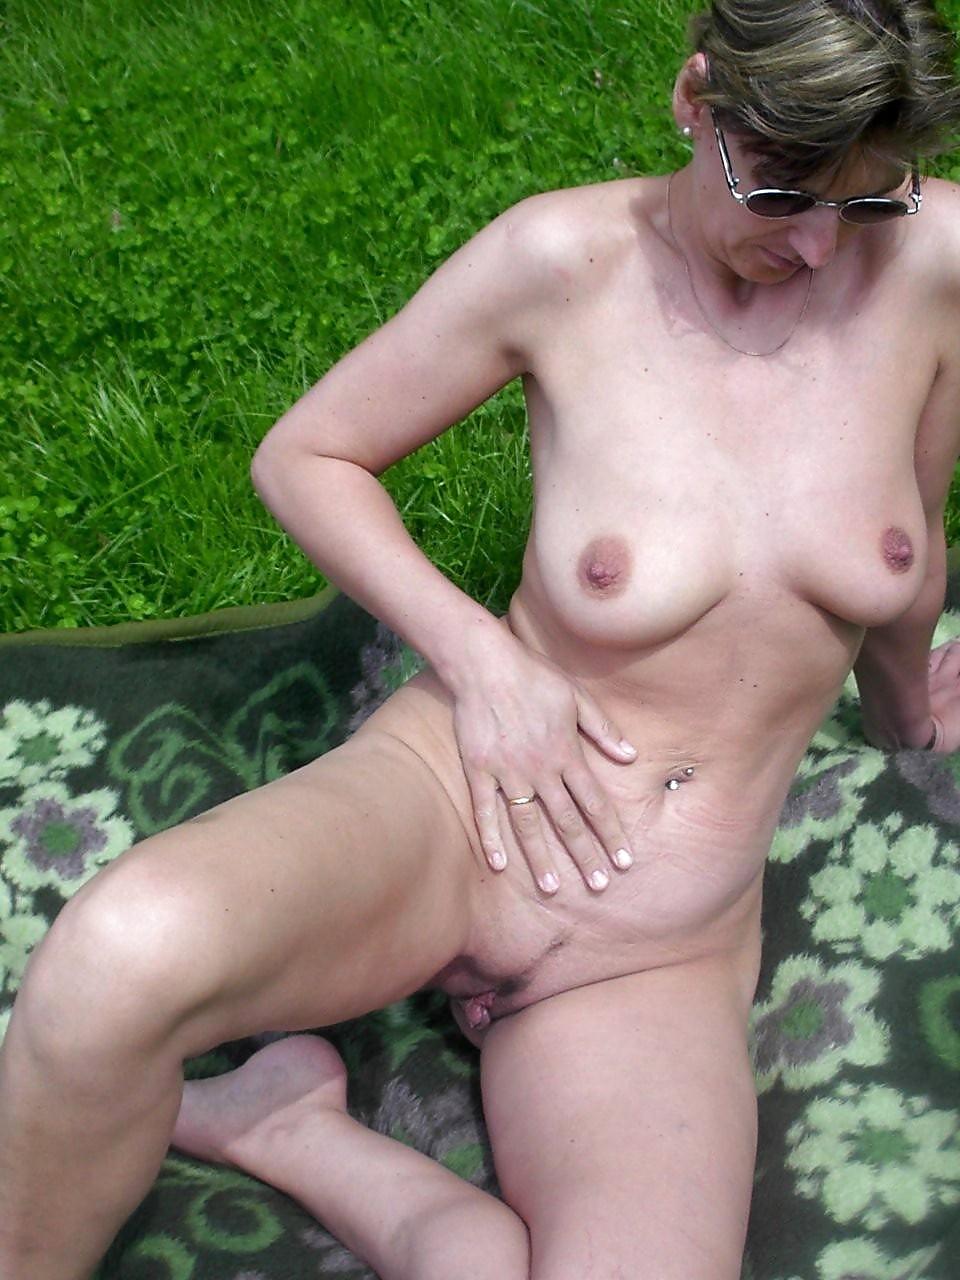 Mature older ladies nude